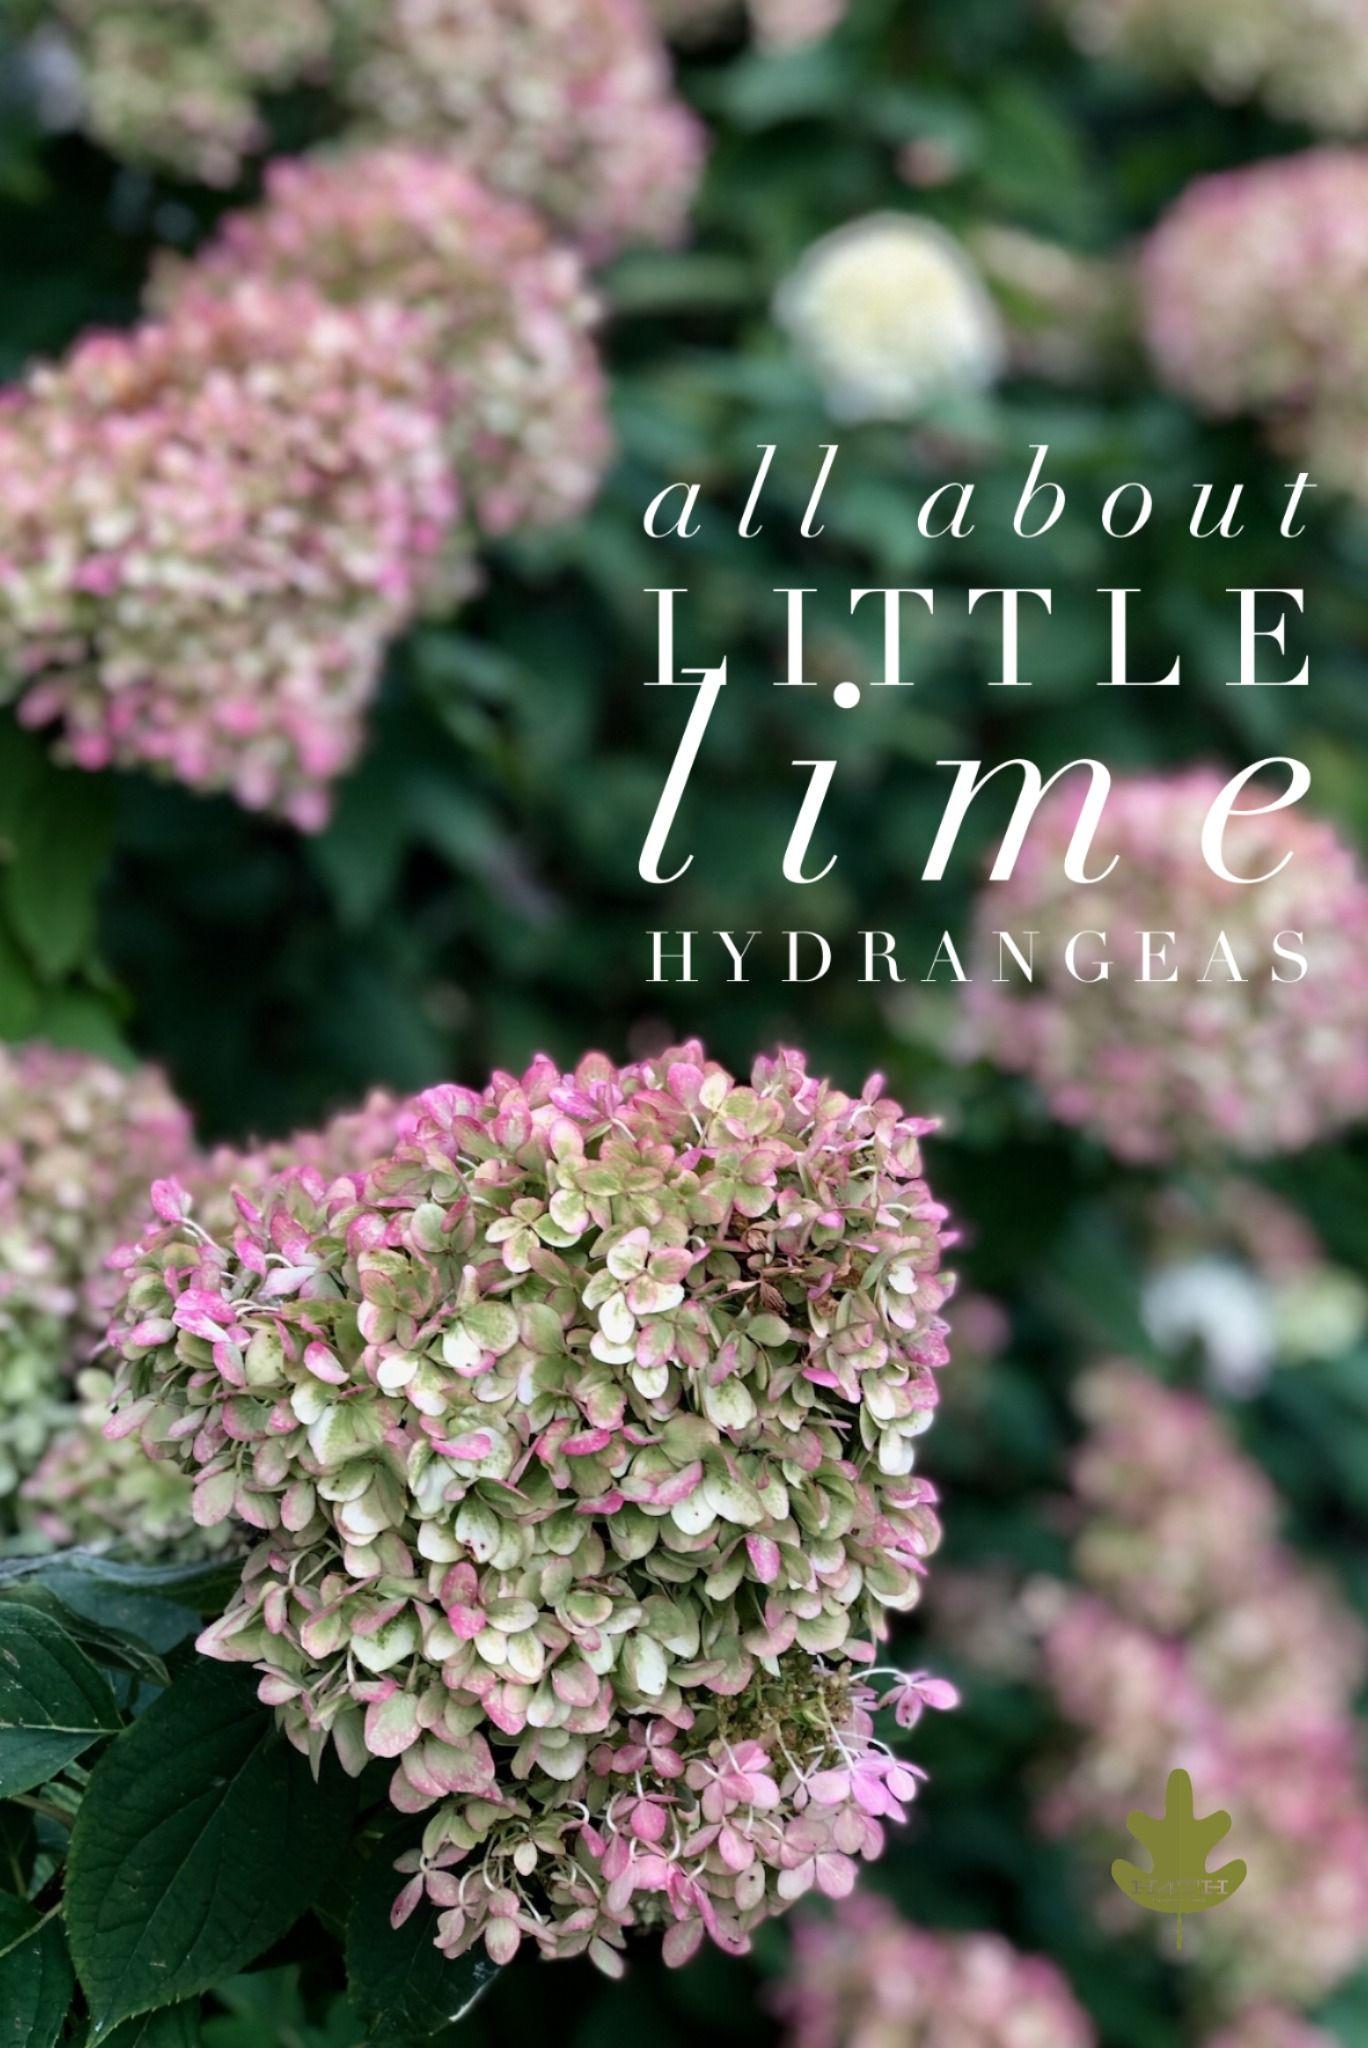 Little Lime Hydrangea Care A Gardener S Guide In 2020 Little Lime Hydrangea Hydrangea Landscaping Hydrangea Care